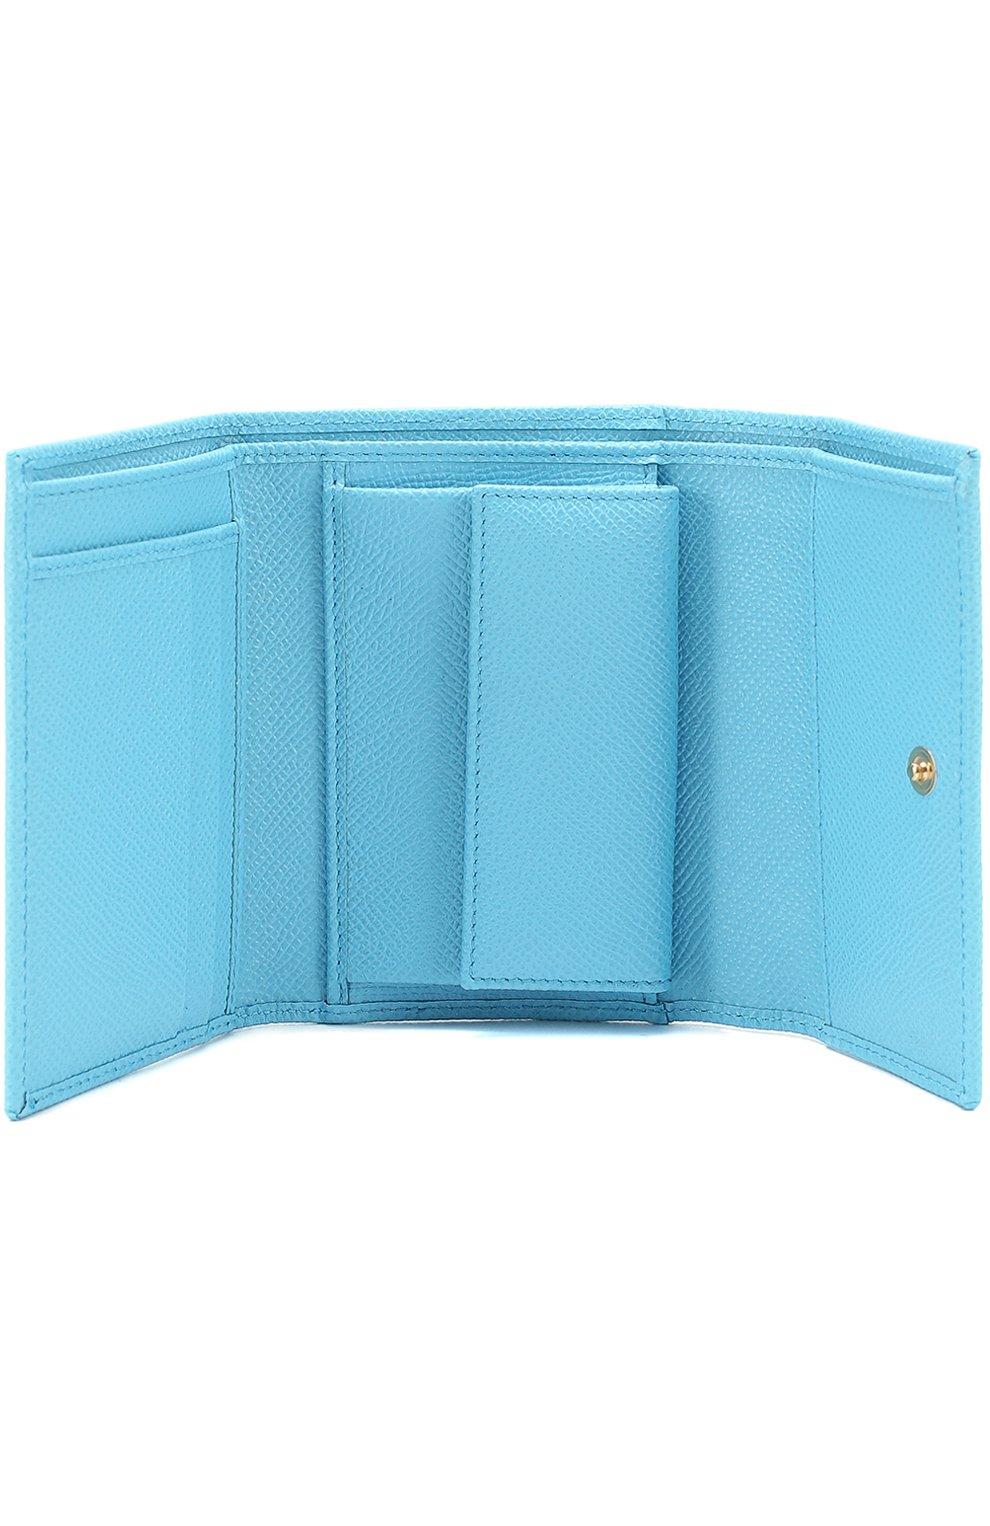 Кожаное портмоне Dolce & Gabbana голубого цвета | Фото №3